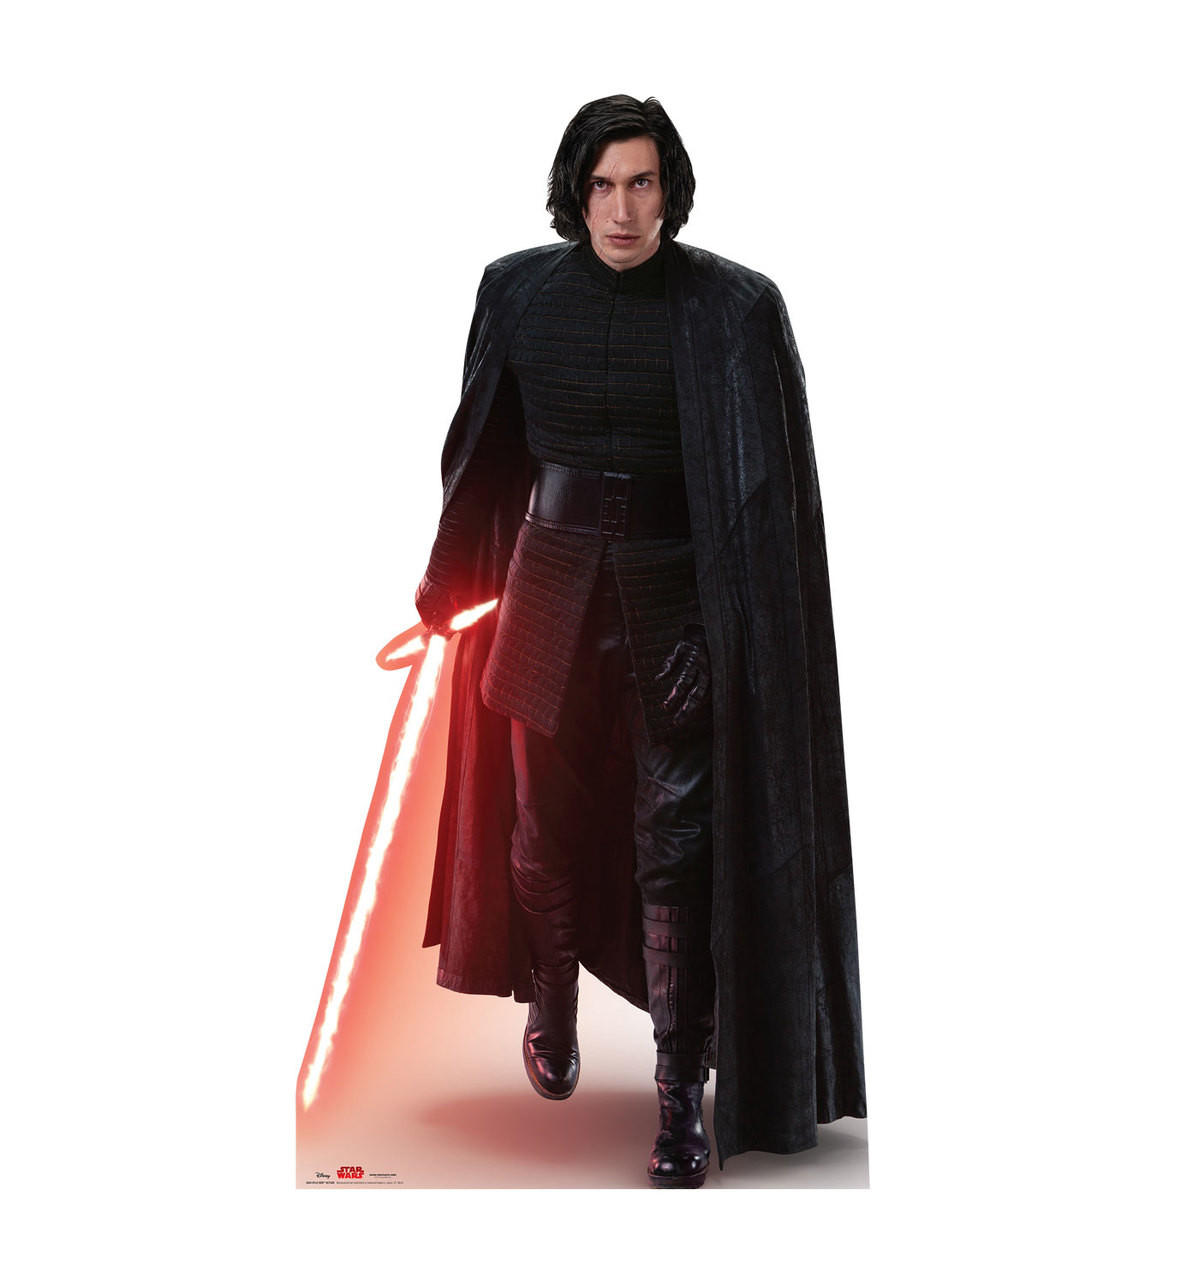 Kylo Ren™ Action - Star Wars: The Last Jedi Life-Size Cardboard Cutout 1